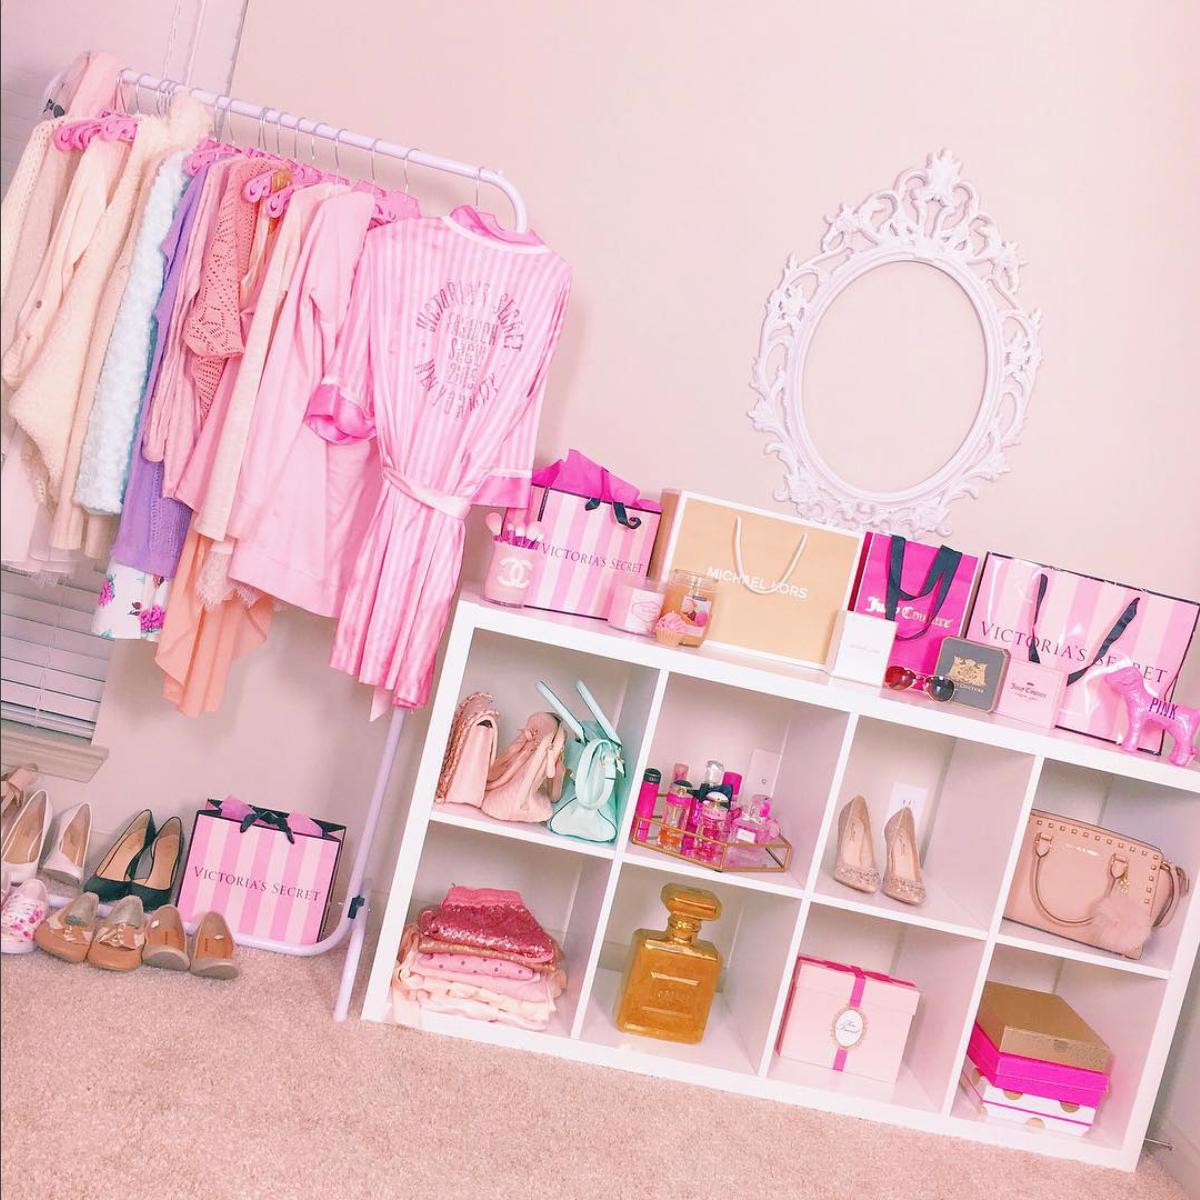 Girly Bedroom Decor Girls Bedroom Door Bedroom Design Plan Inside House Background Bedroom: ™� Lovely Girly Things ™�